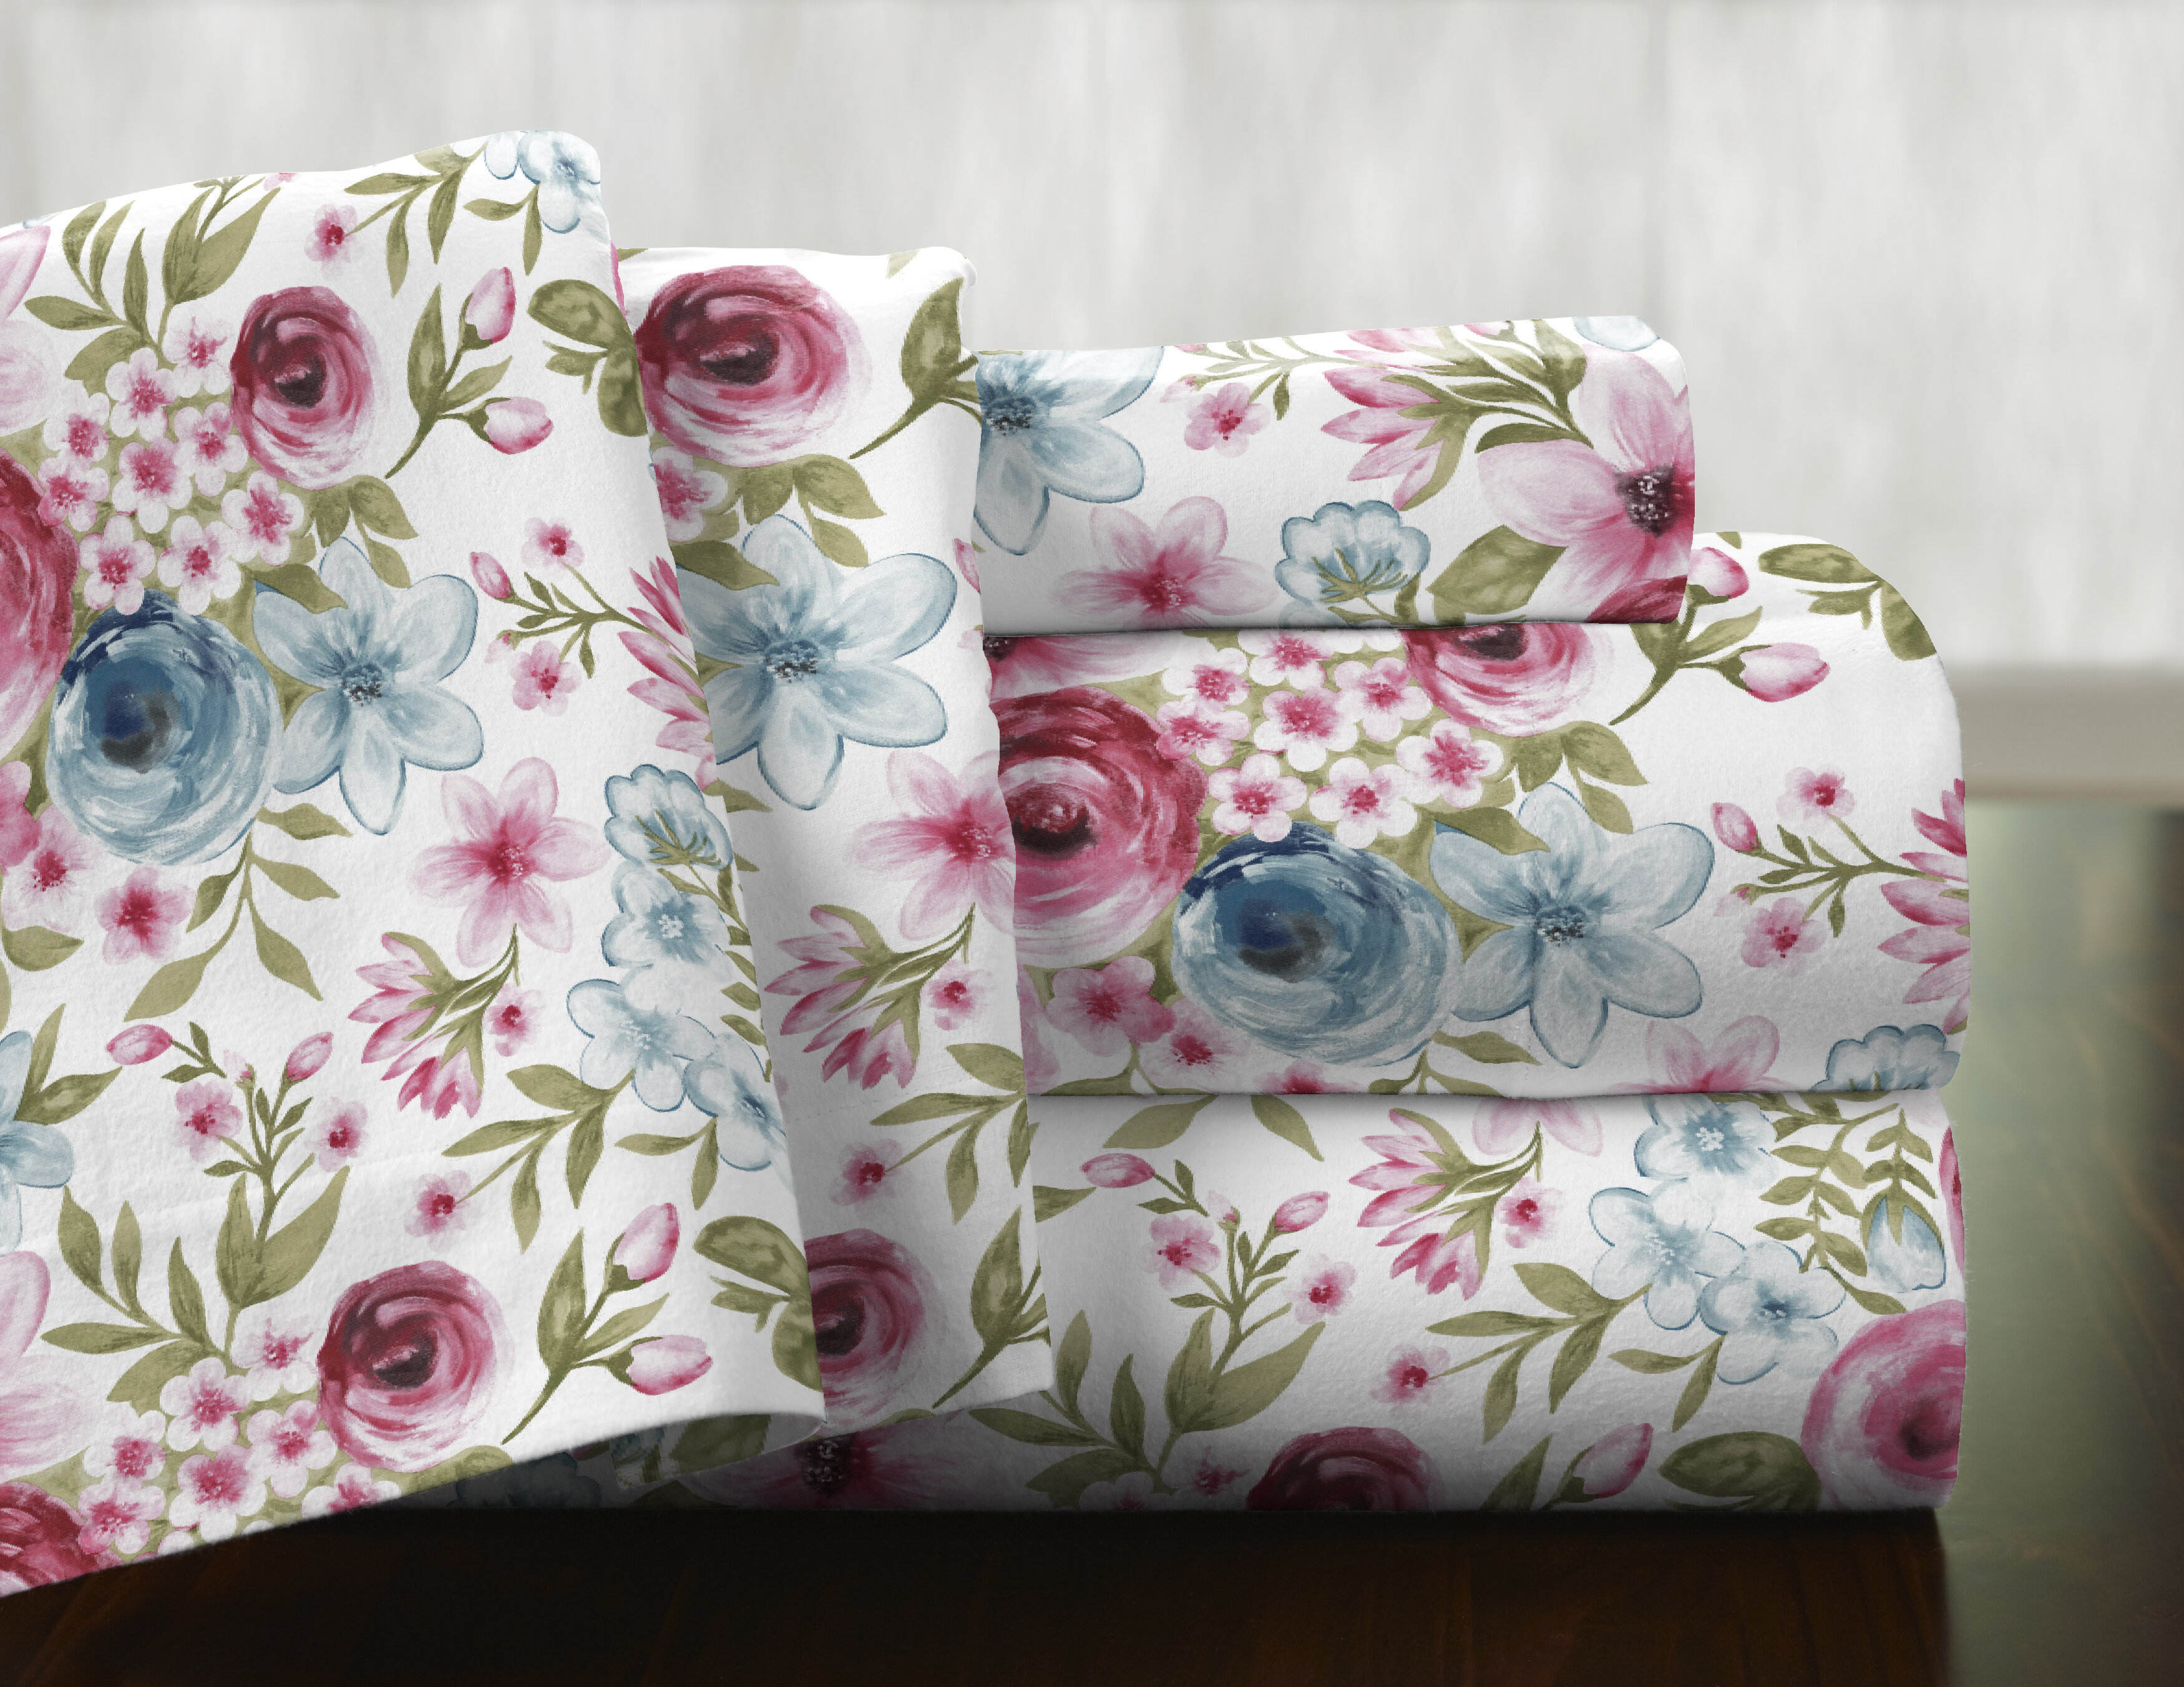 August Grove Penitas Floral Flower 100 Cotton Flannel Sheet Set Reviews